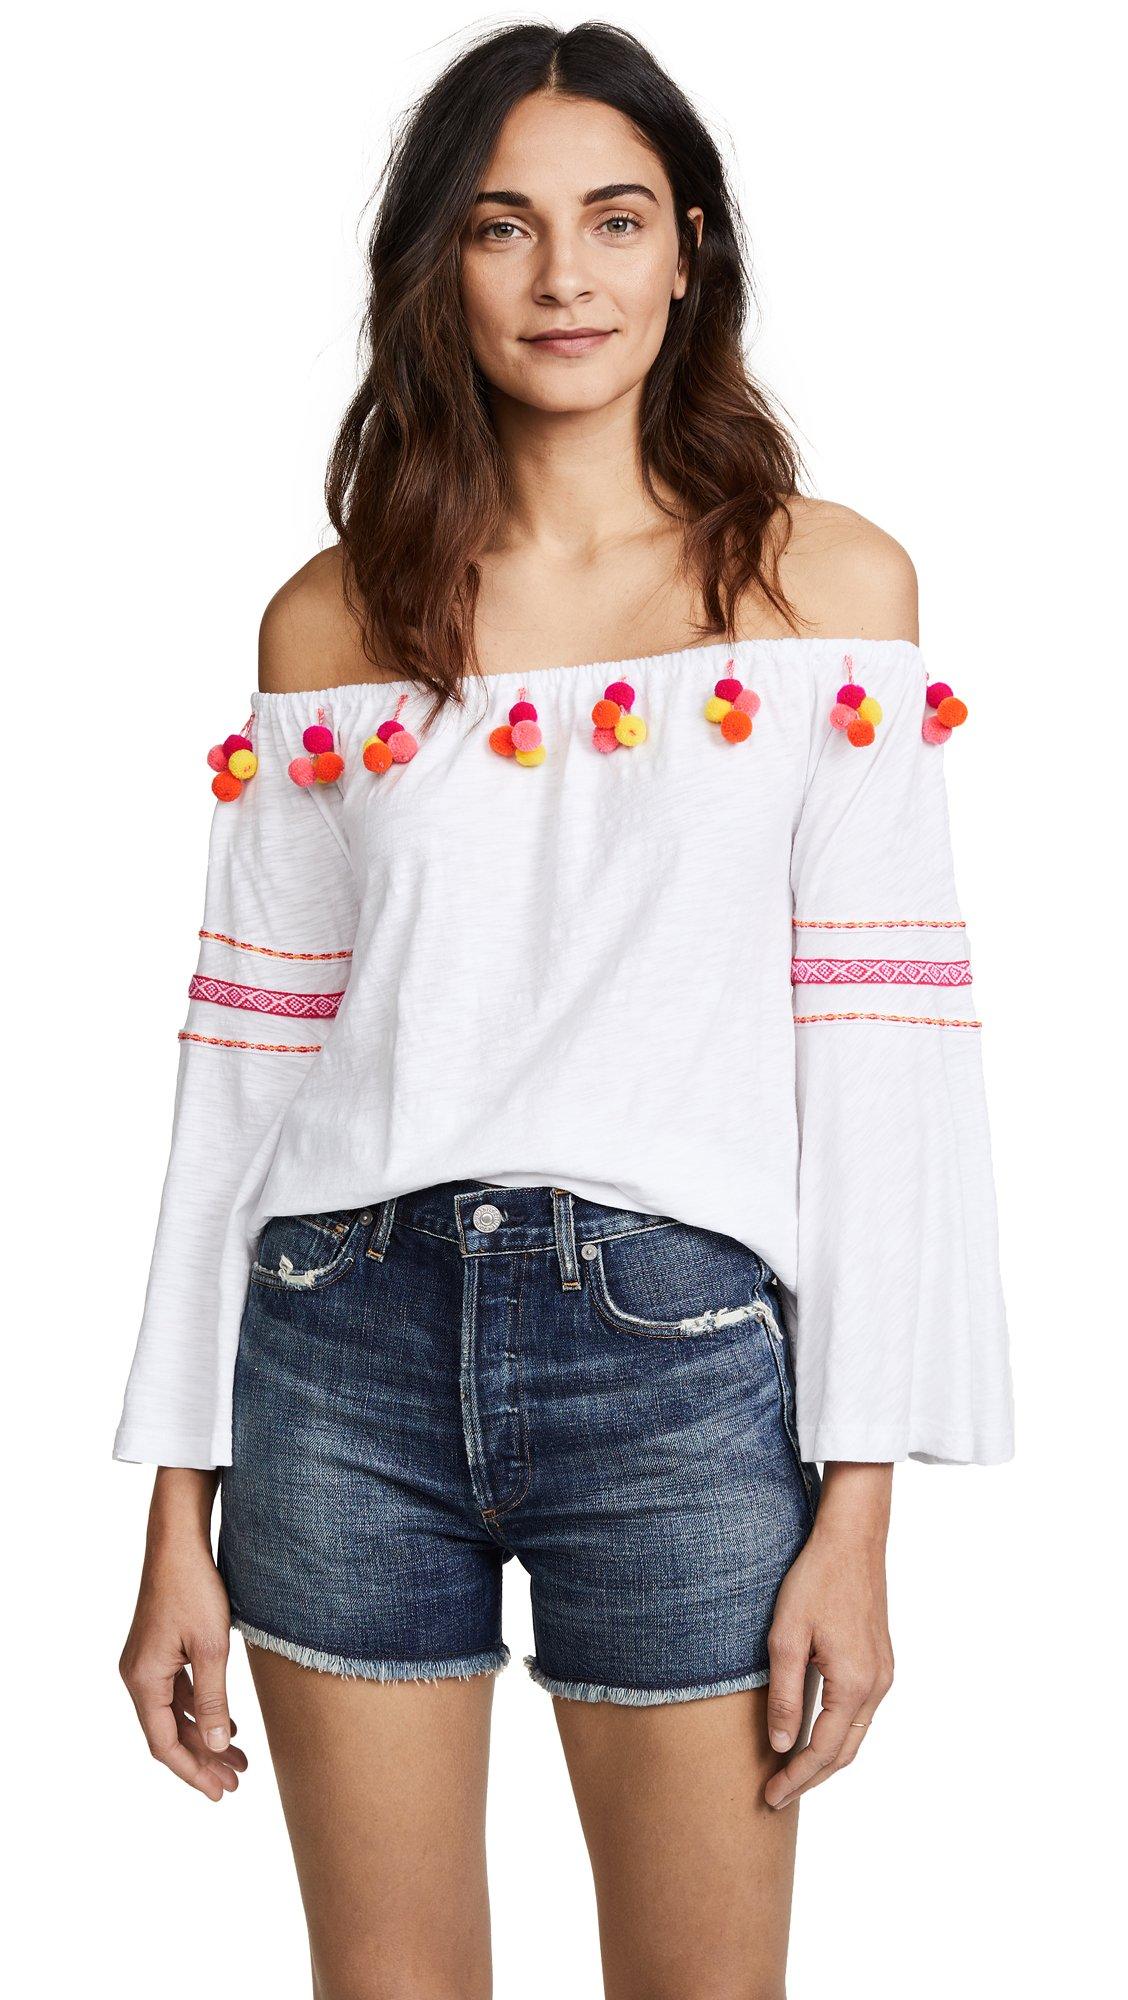 Pitusa Women's Pima Twiggy Top, White, One Size